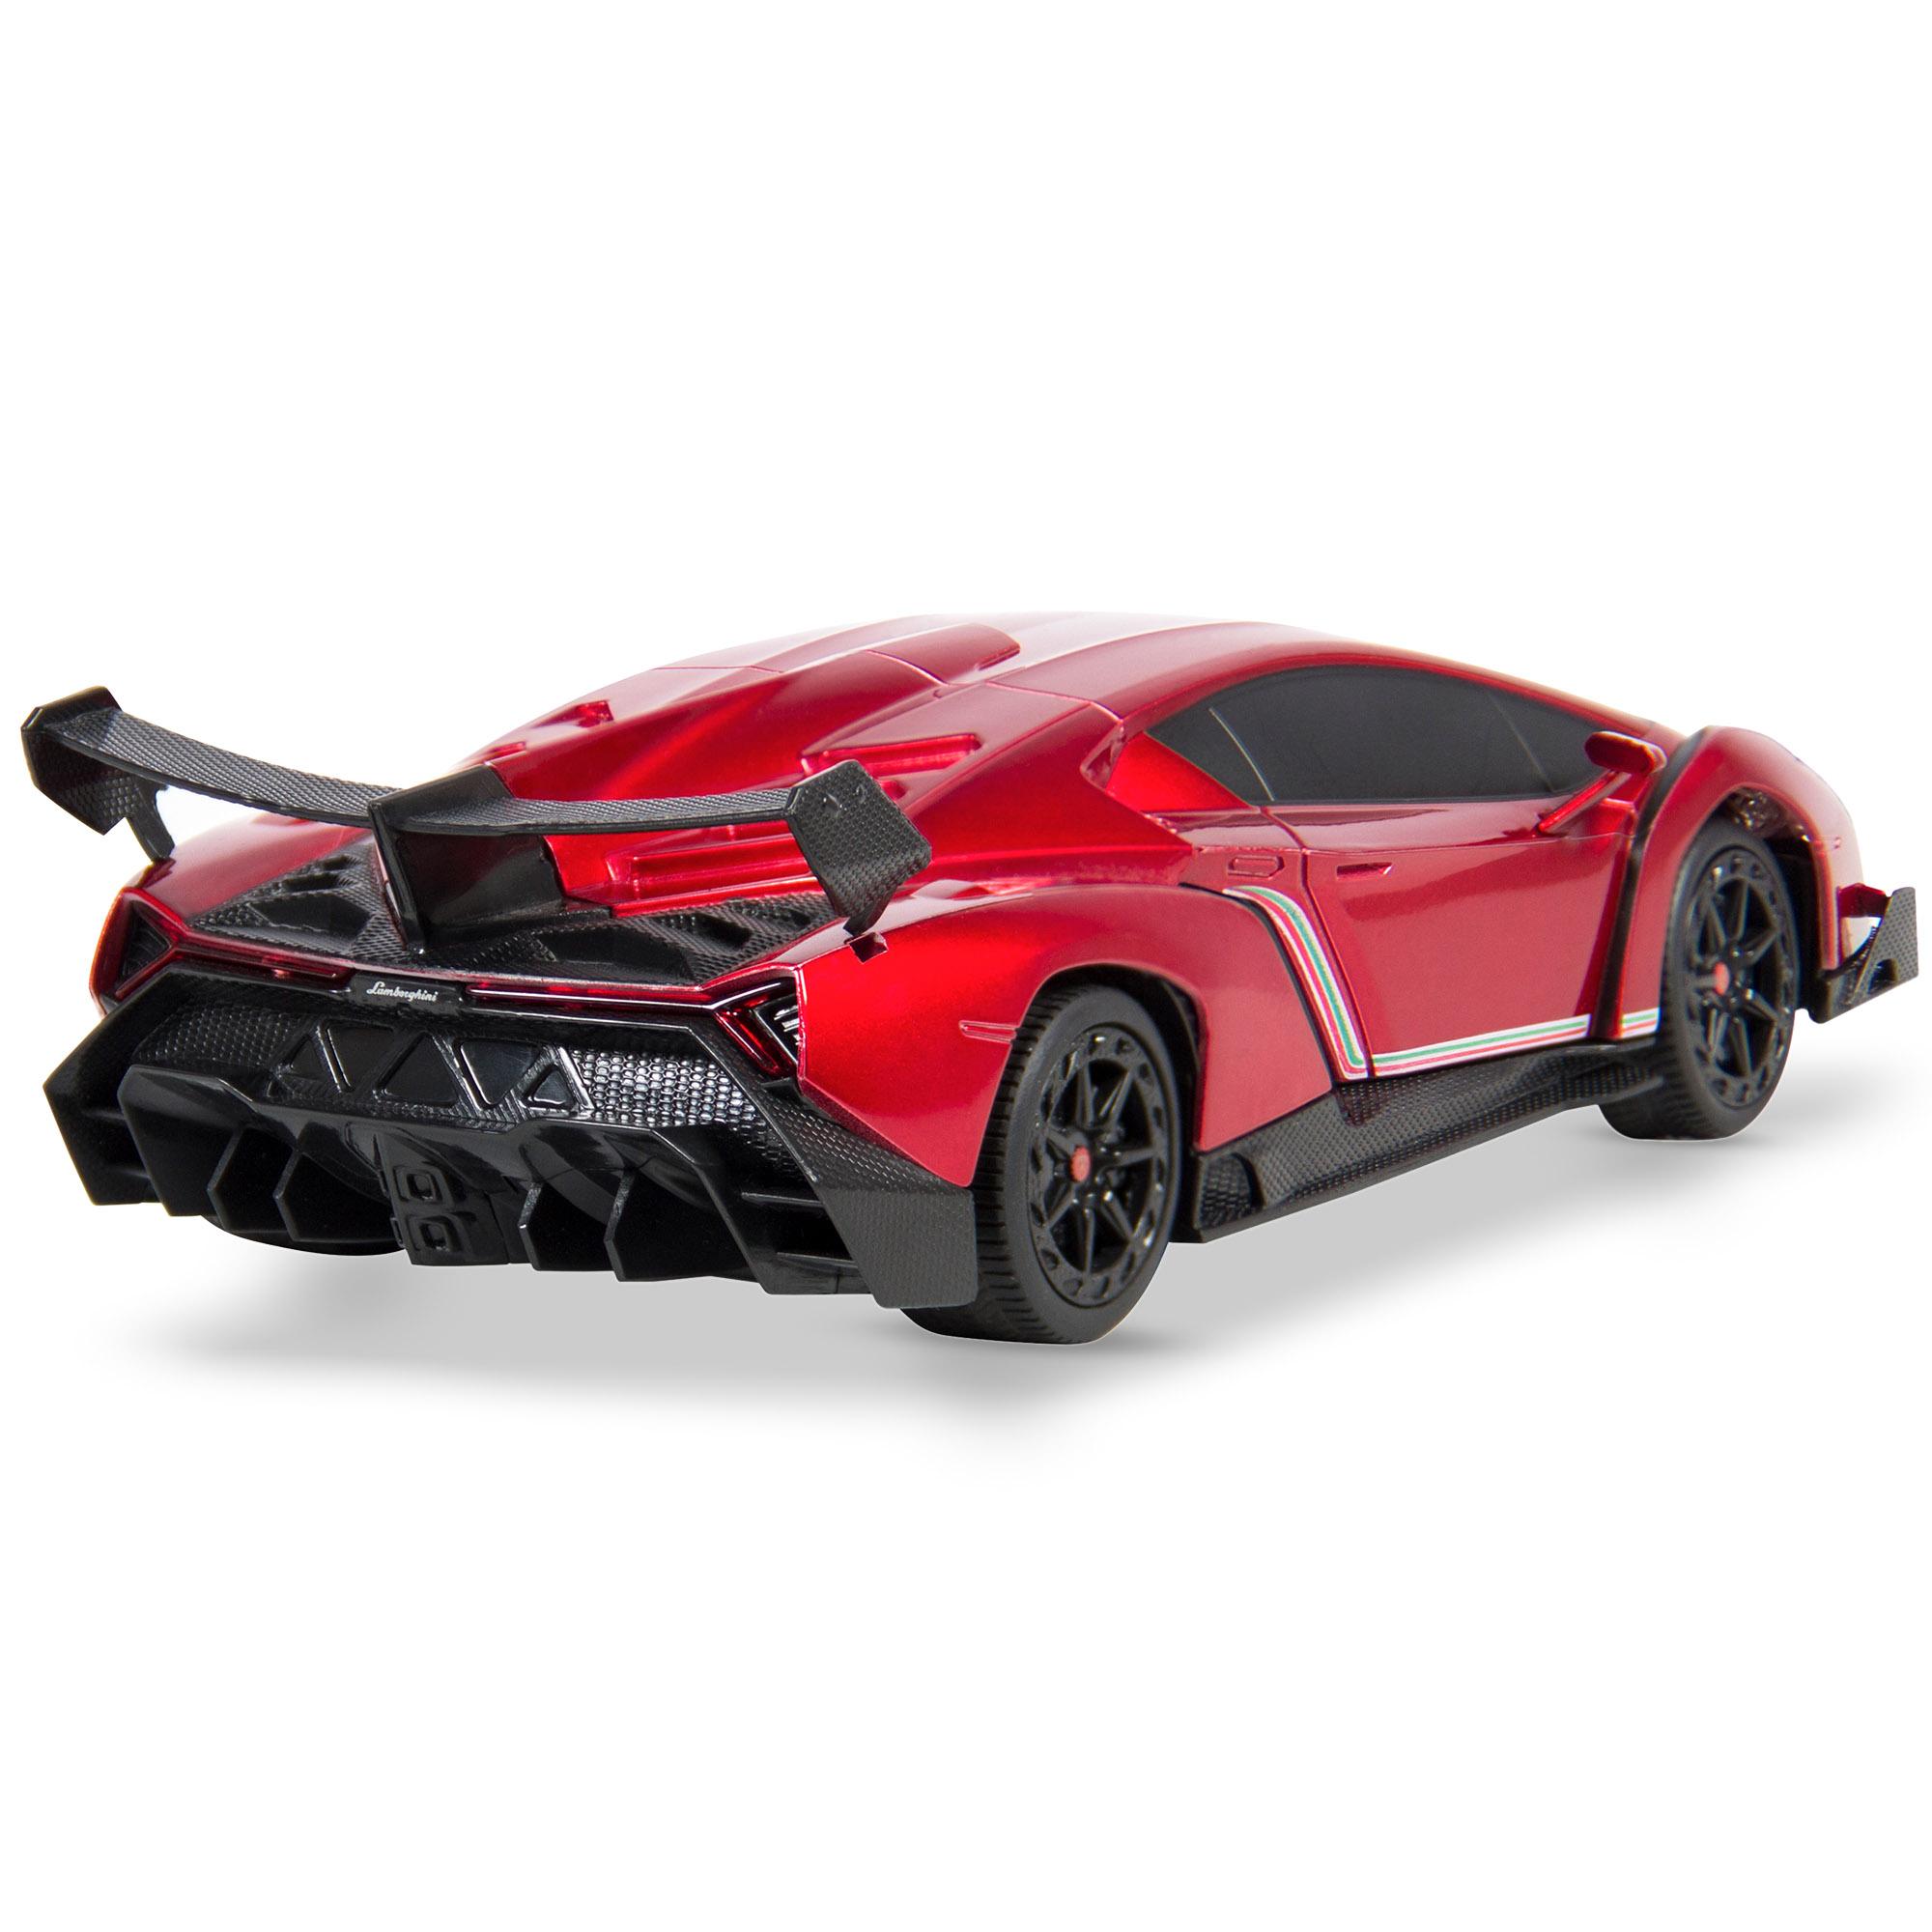 BCP-1-24-Kids-RC-Lamborghini-Veneno-Racing-Car-Toy-w-Lights-Shock-Suspension thumbnail 17